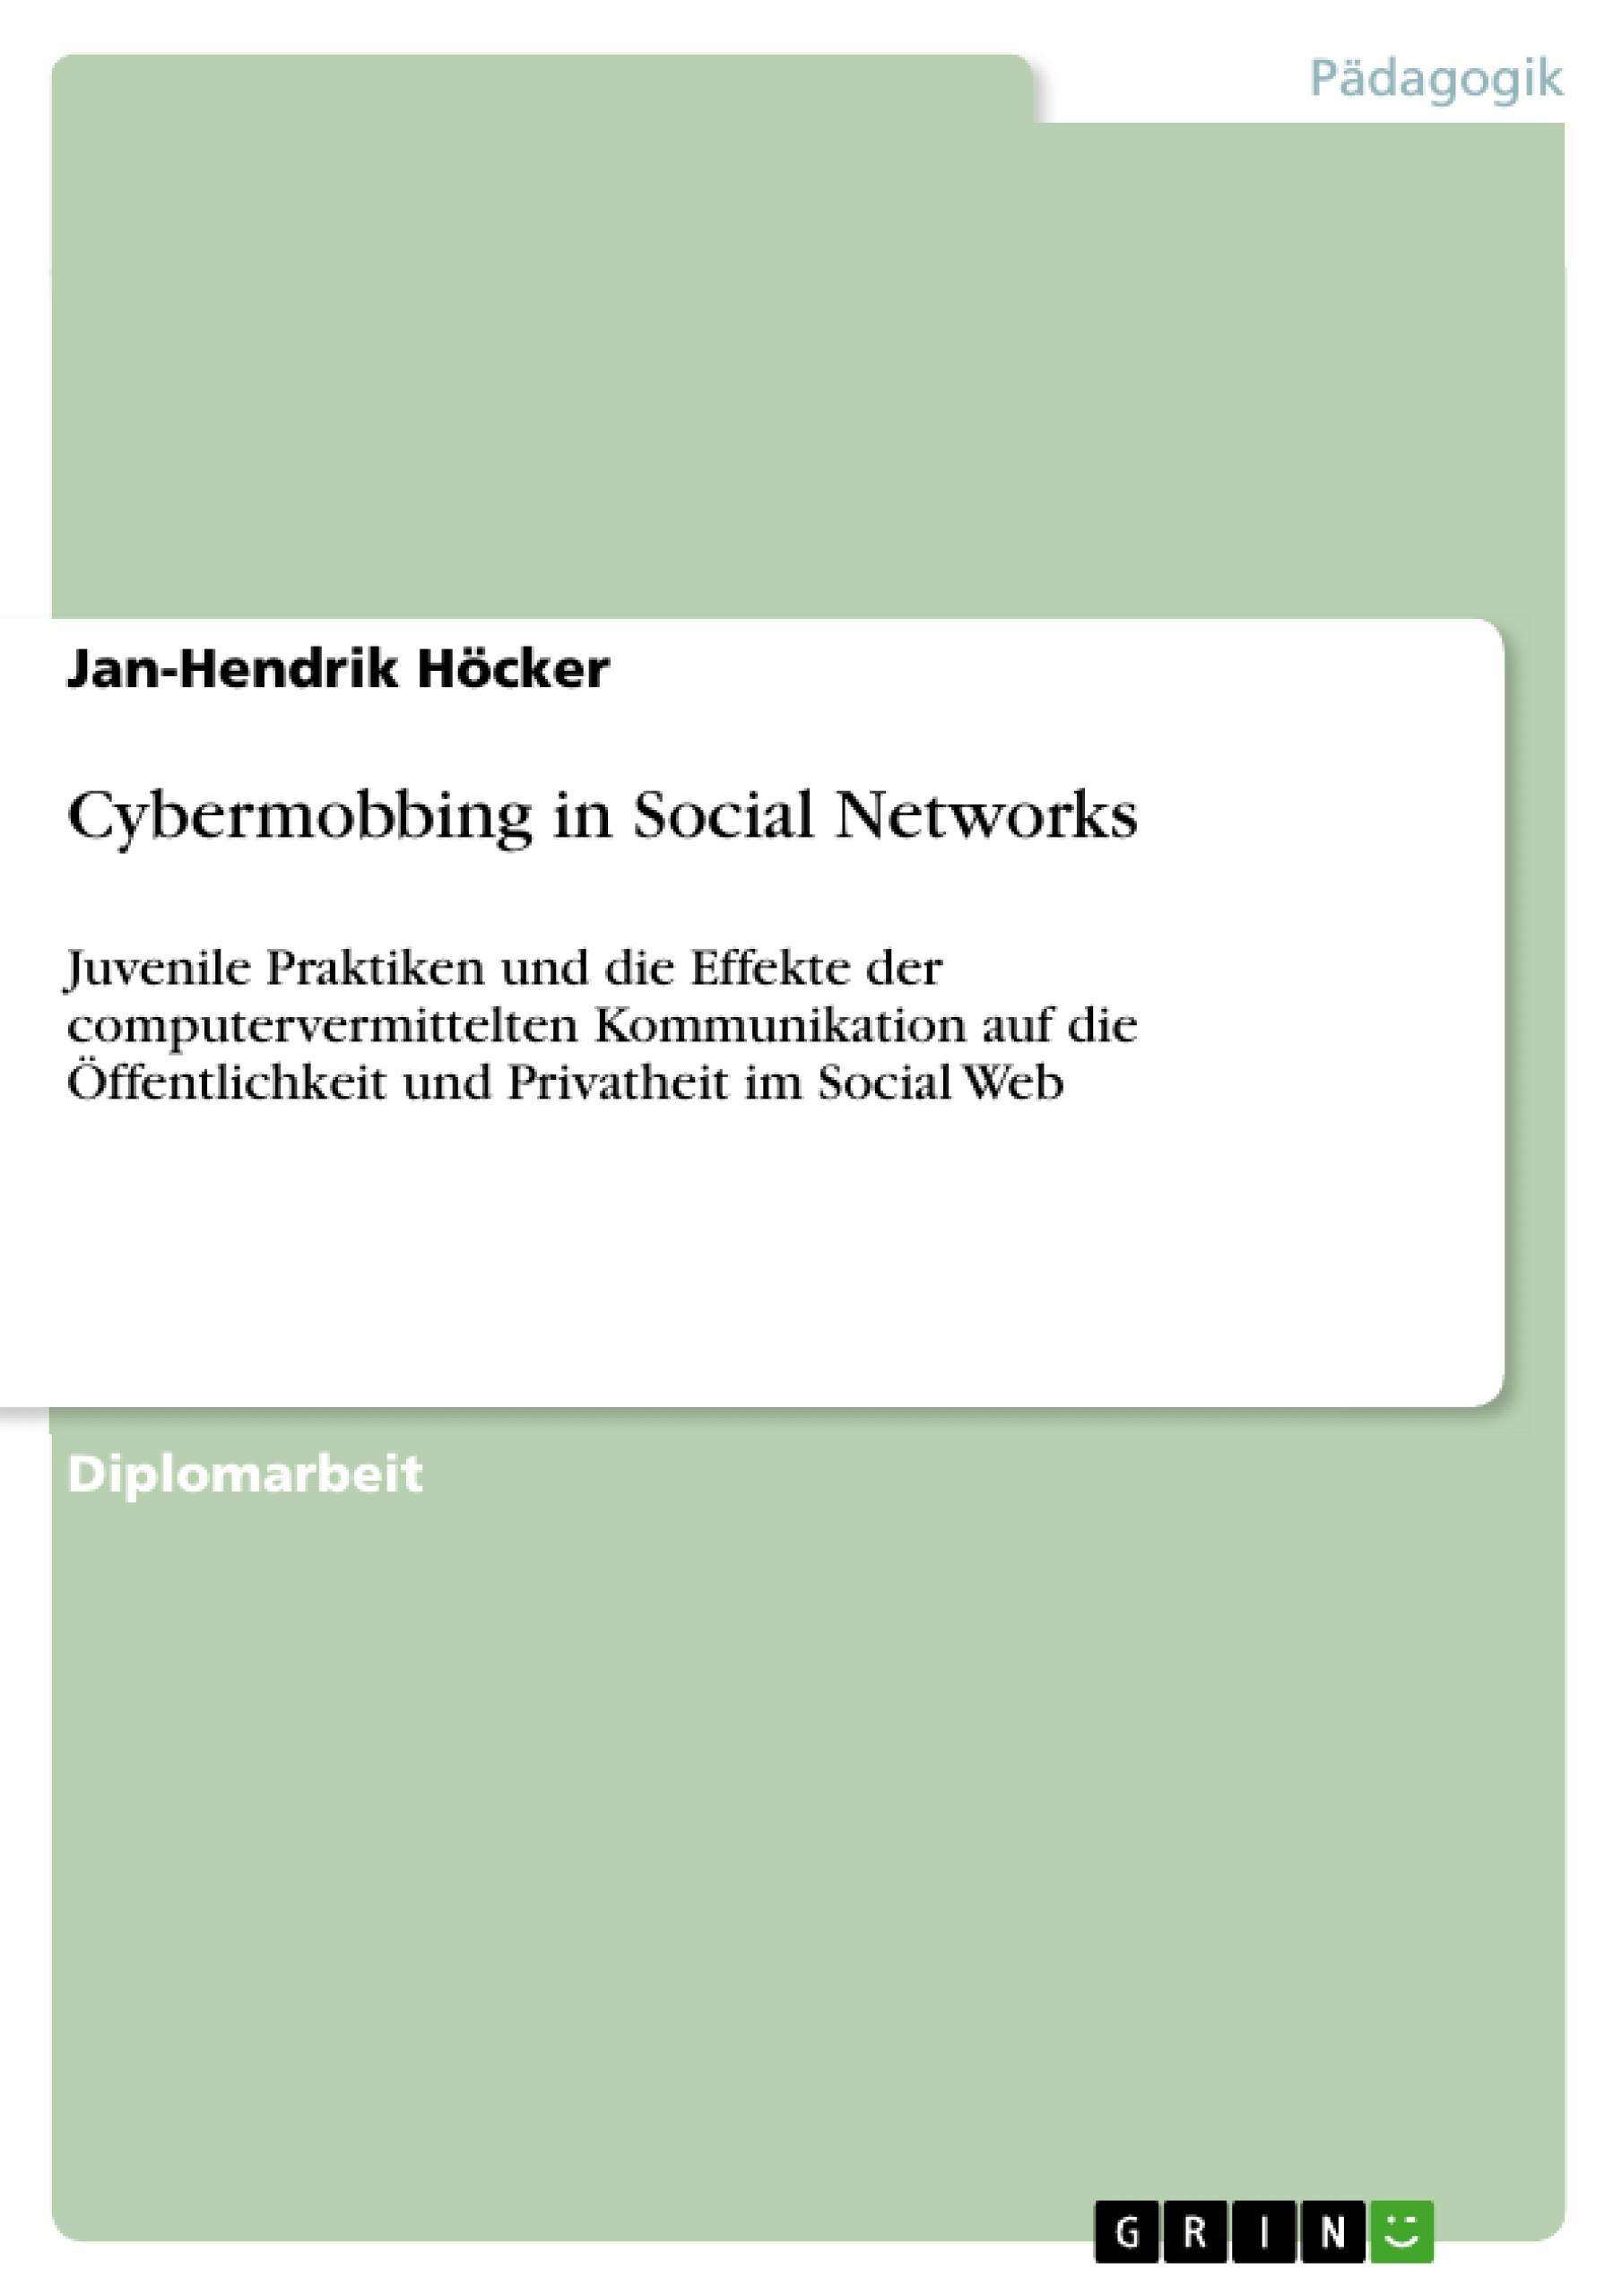 Titel: Cybermobbing in Social Networks